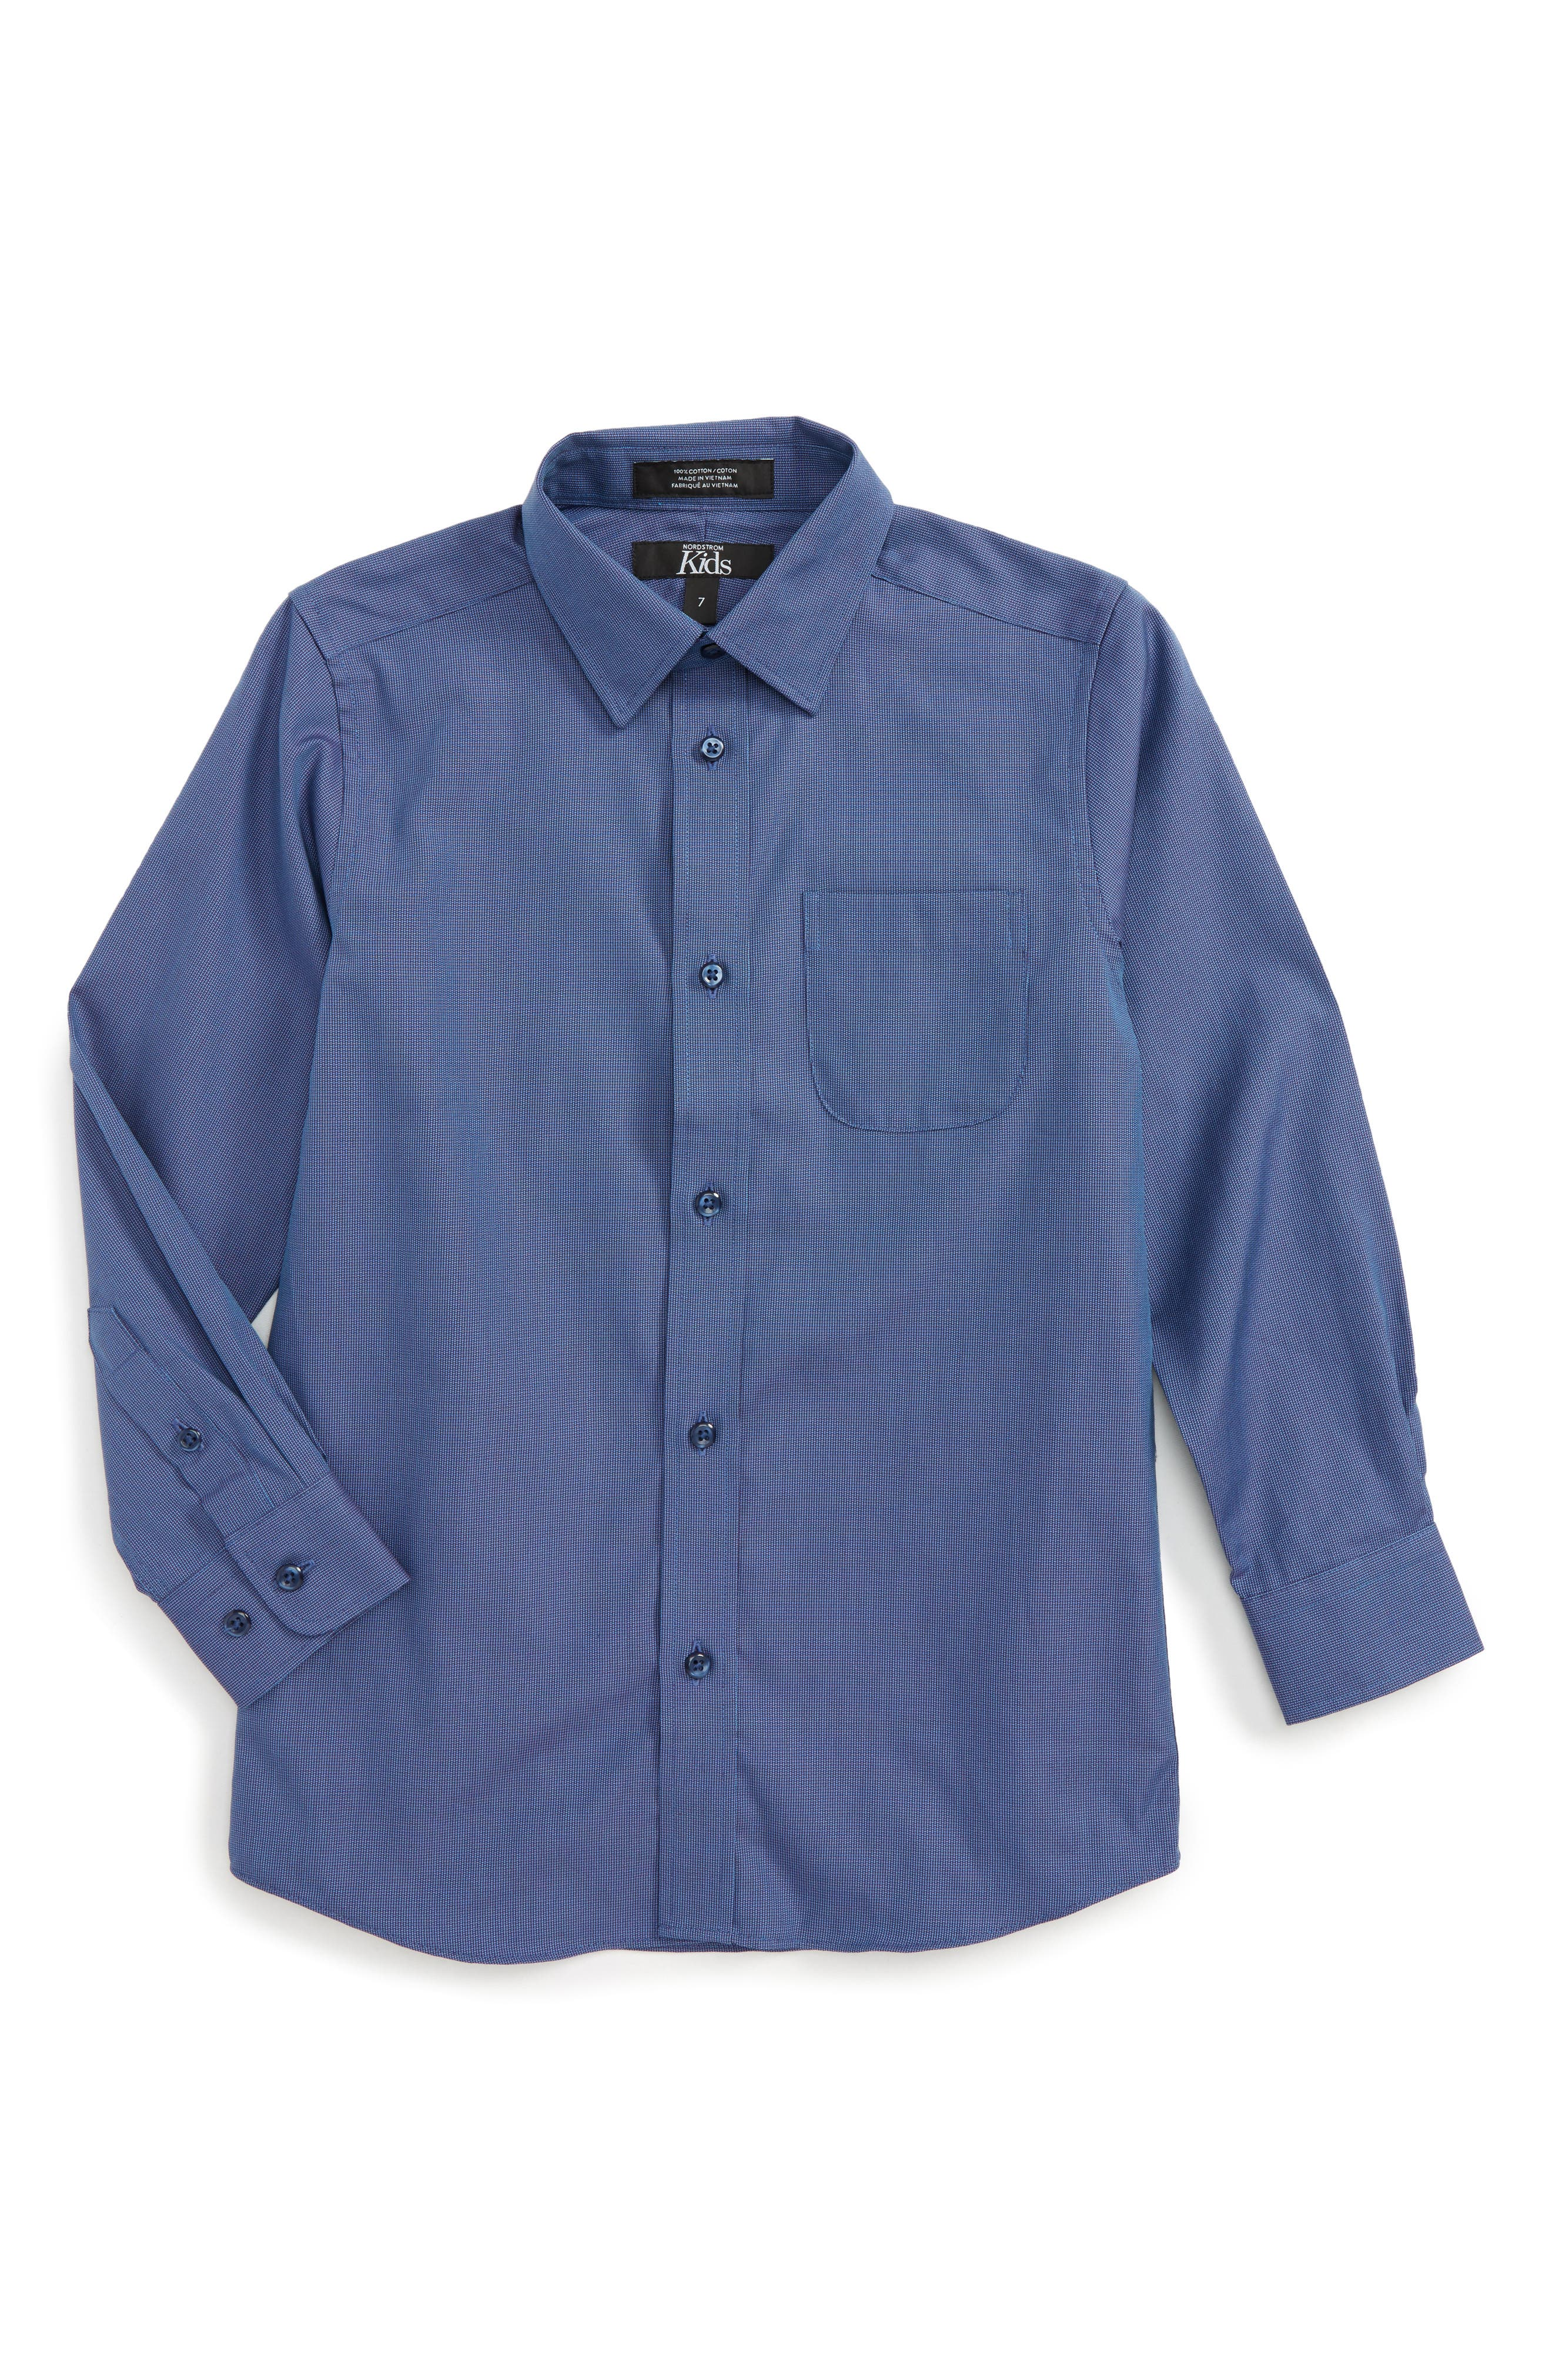 Patriot Cotton Poplin Dress Shirt,                             Main thumbnail 1, color,                             410